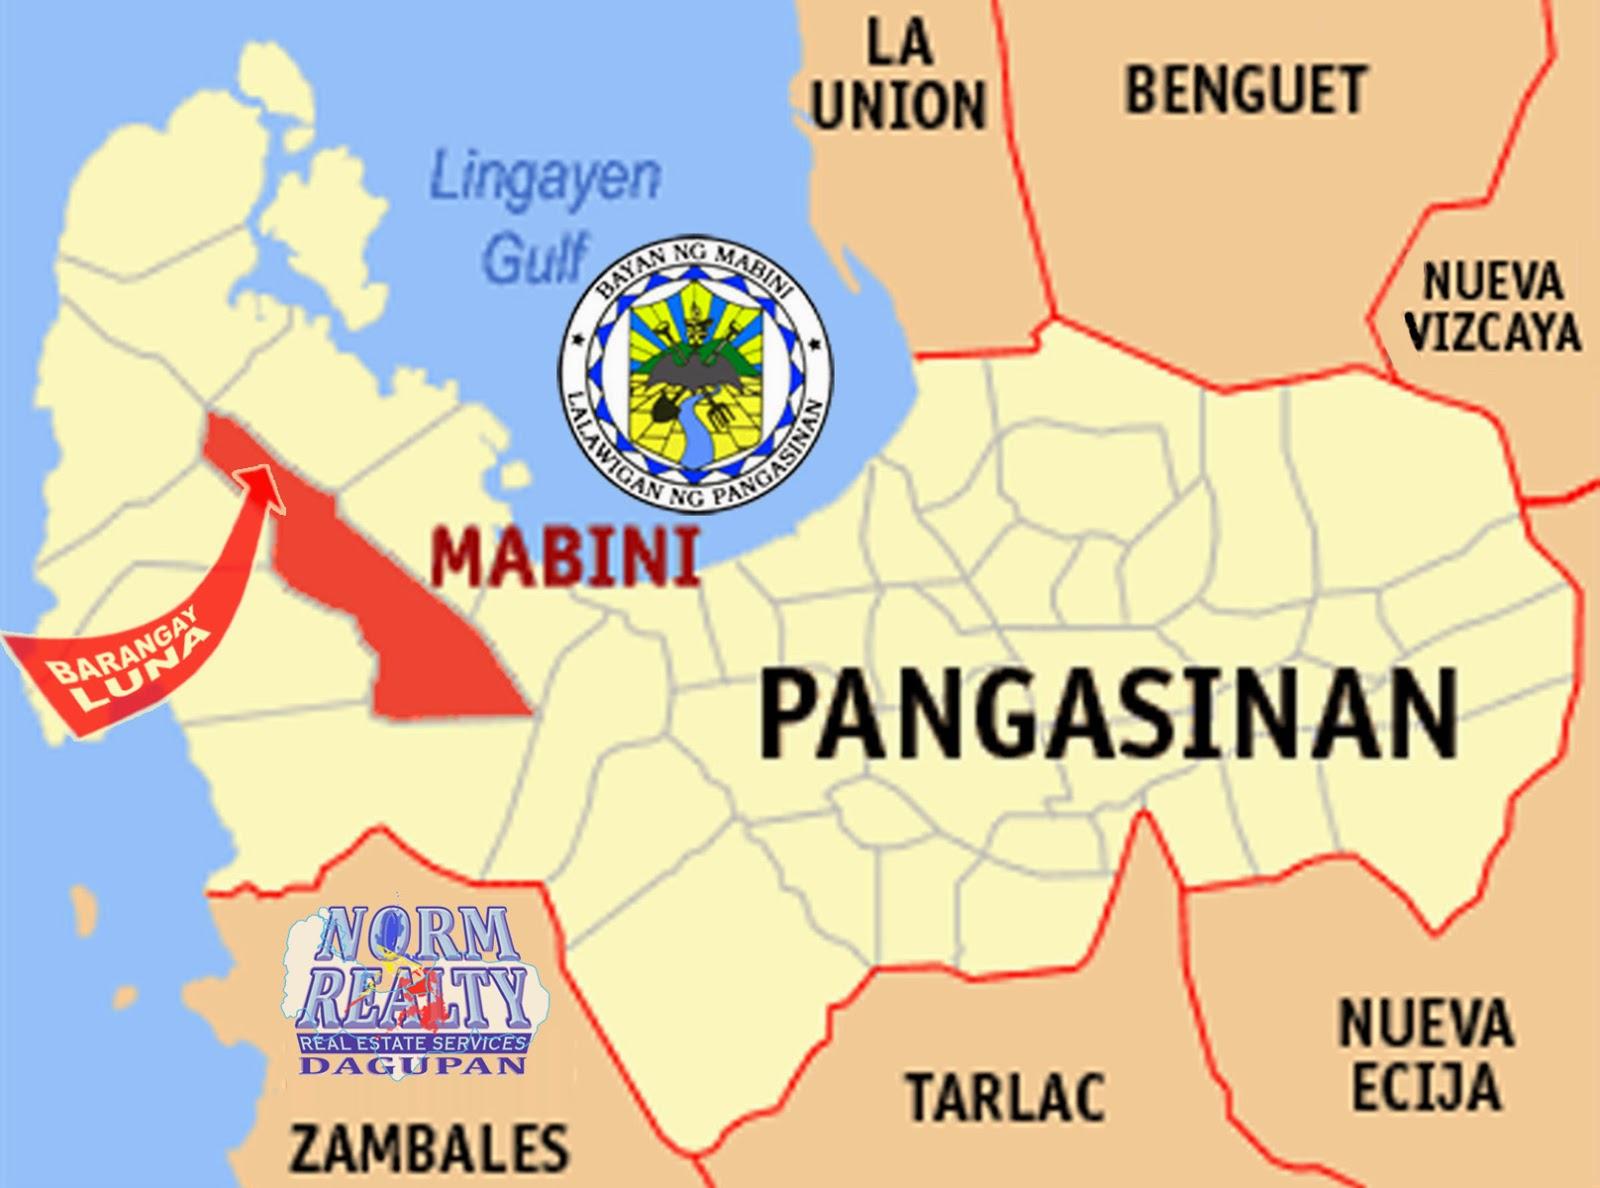 NormRealty Dagupan Mabini Pangasinan 21Hectare Land for